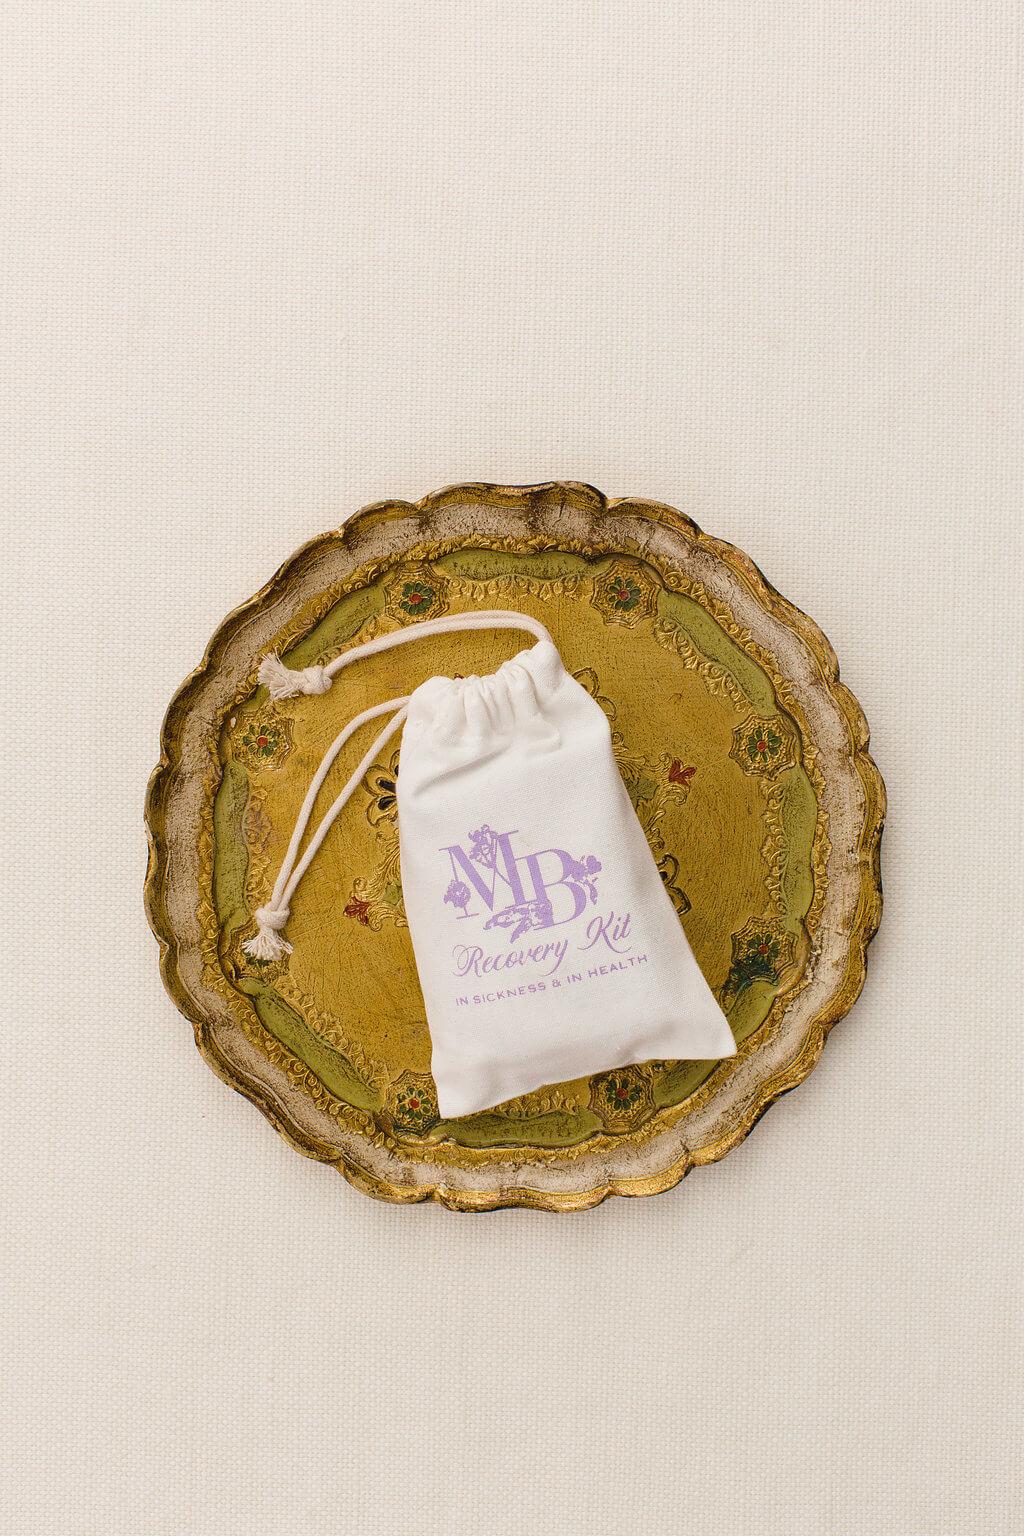 recovery kit drawstring bag with custom wedding monogram